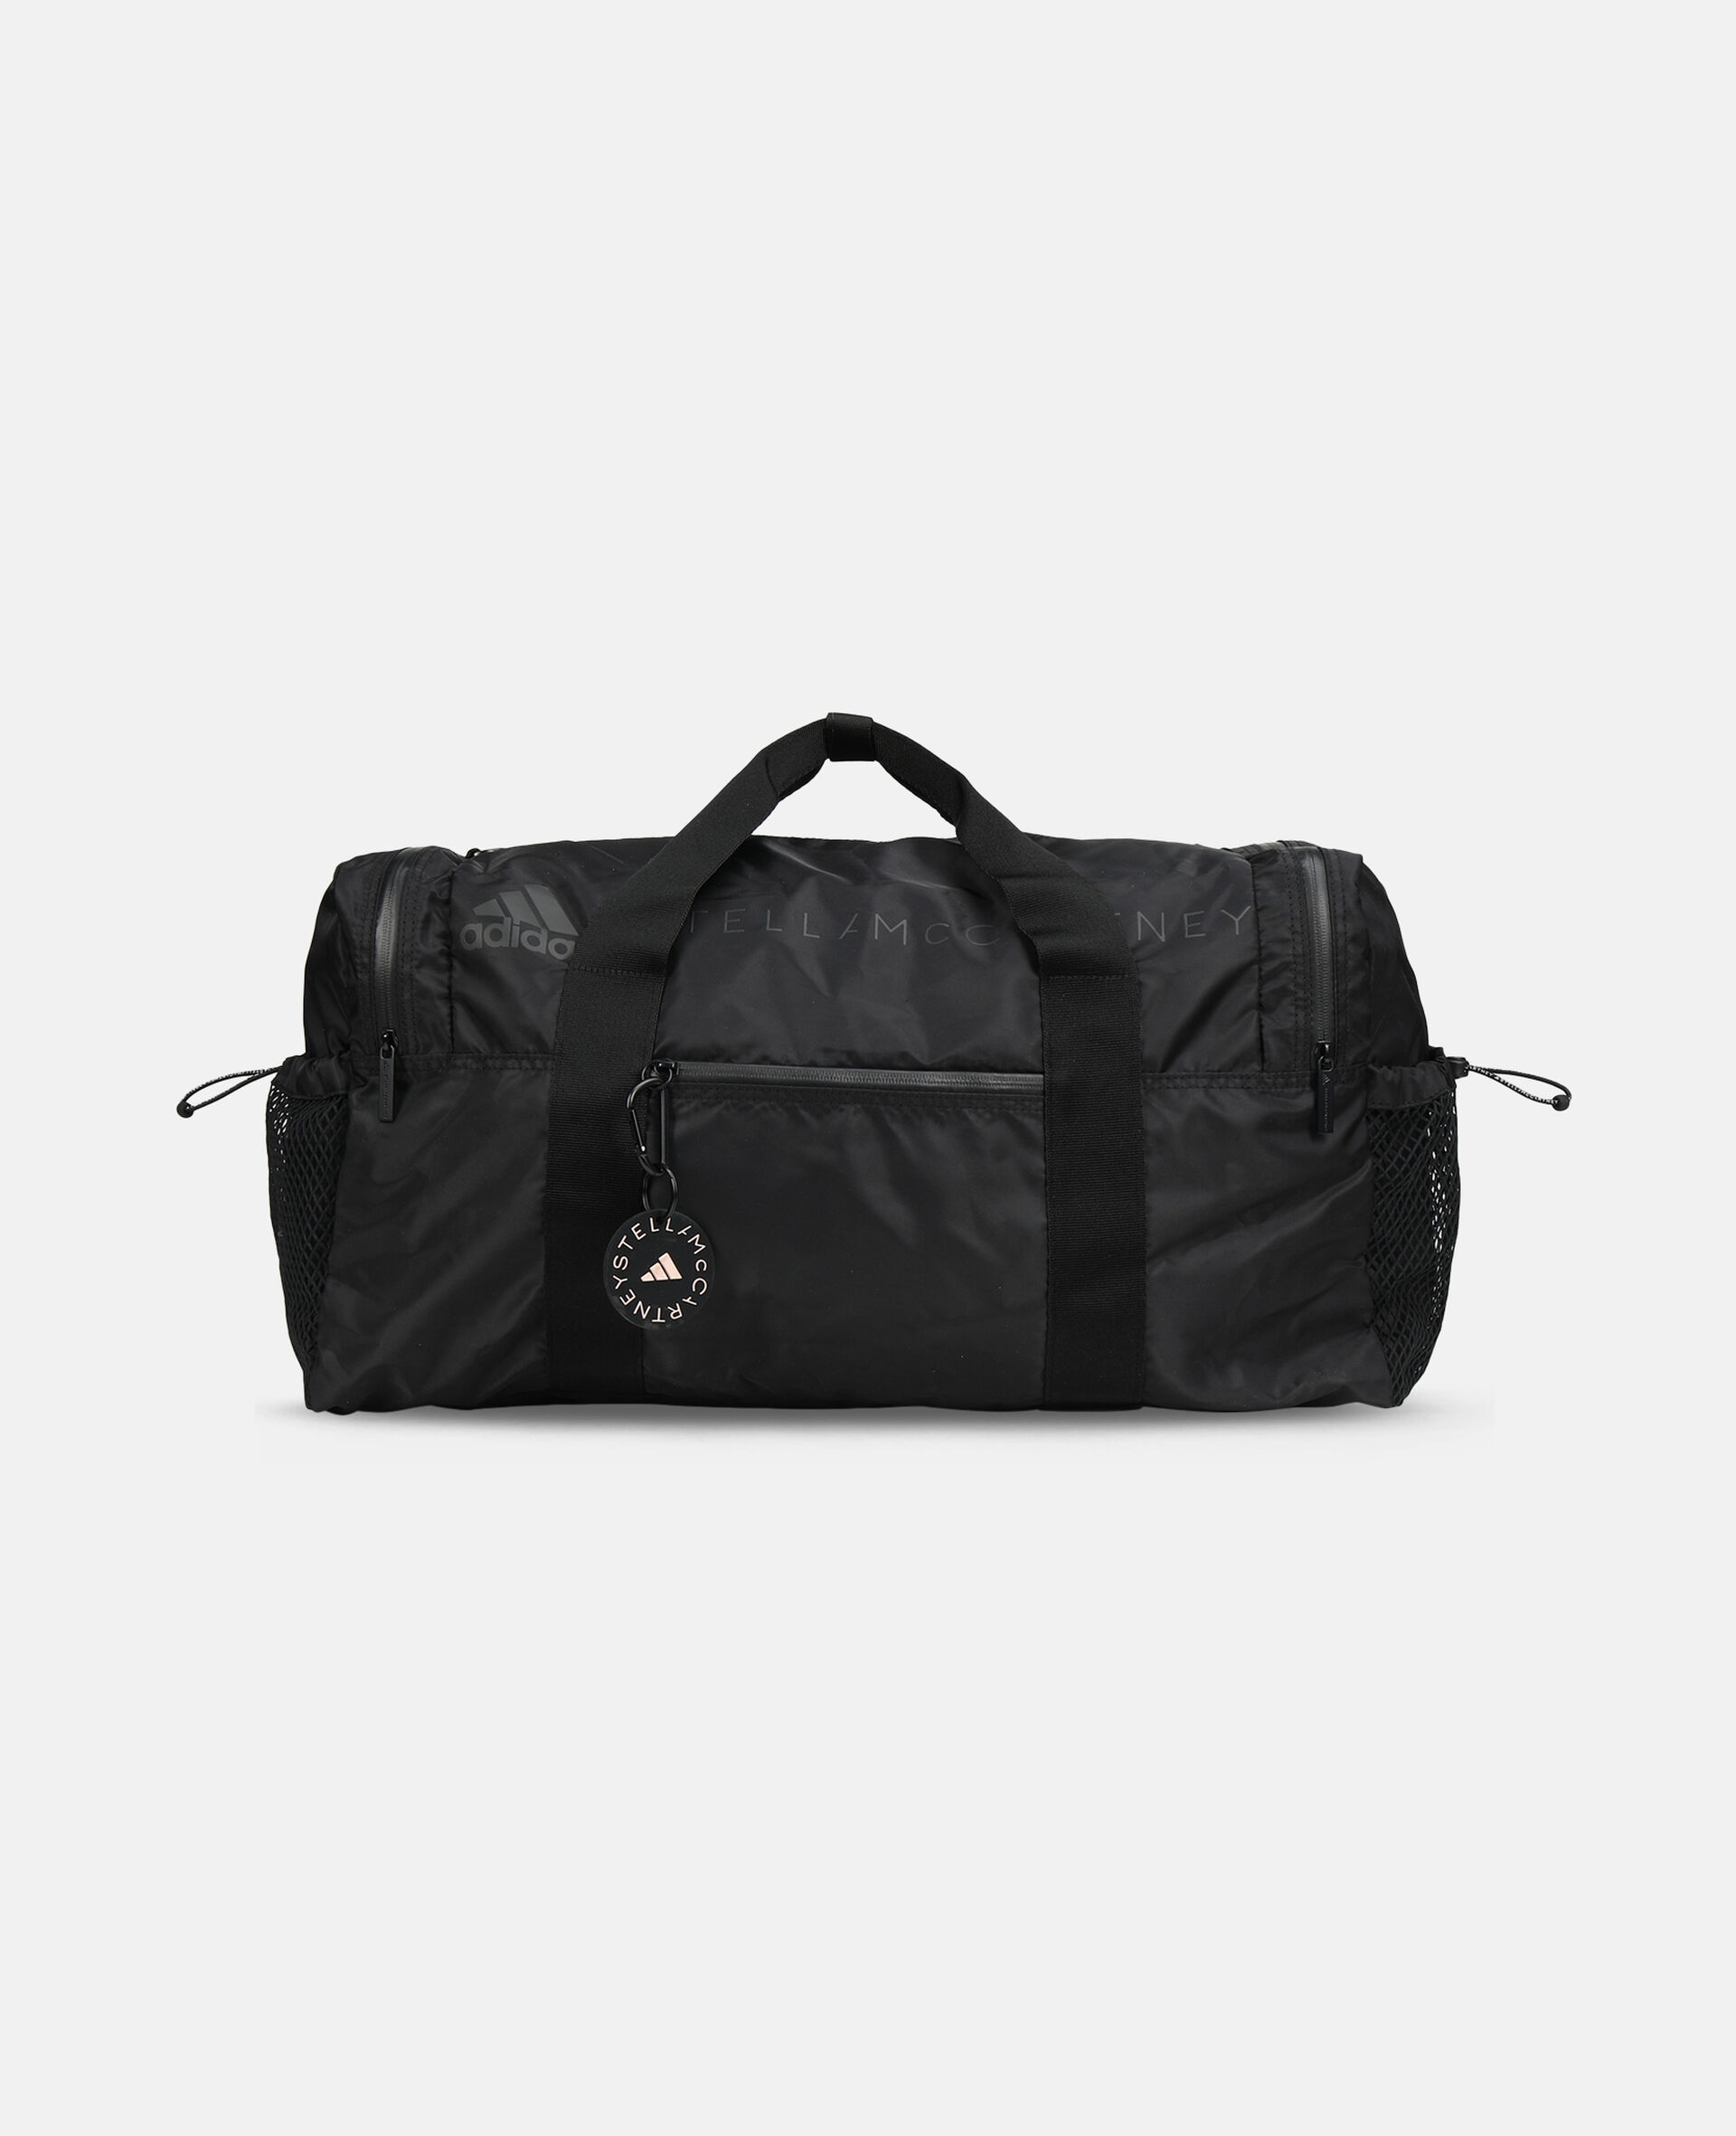 Sac Studiobag carré noir-Noir-large image number 0